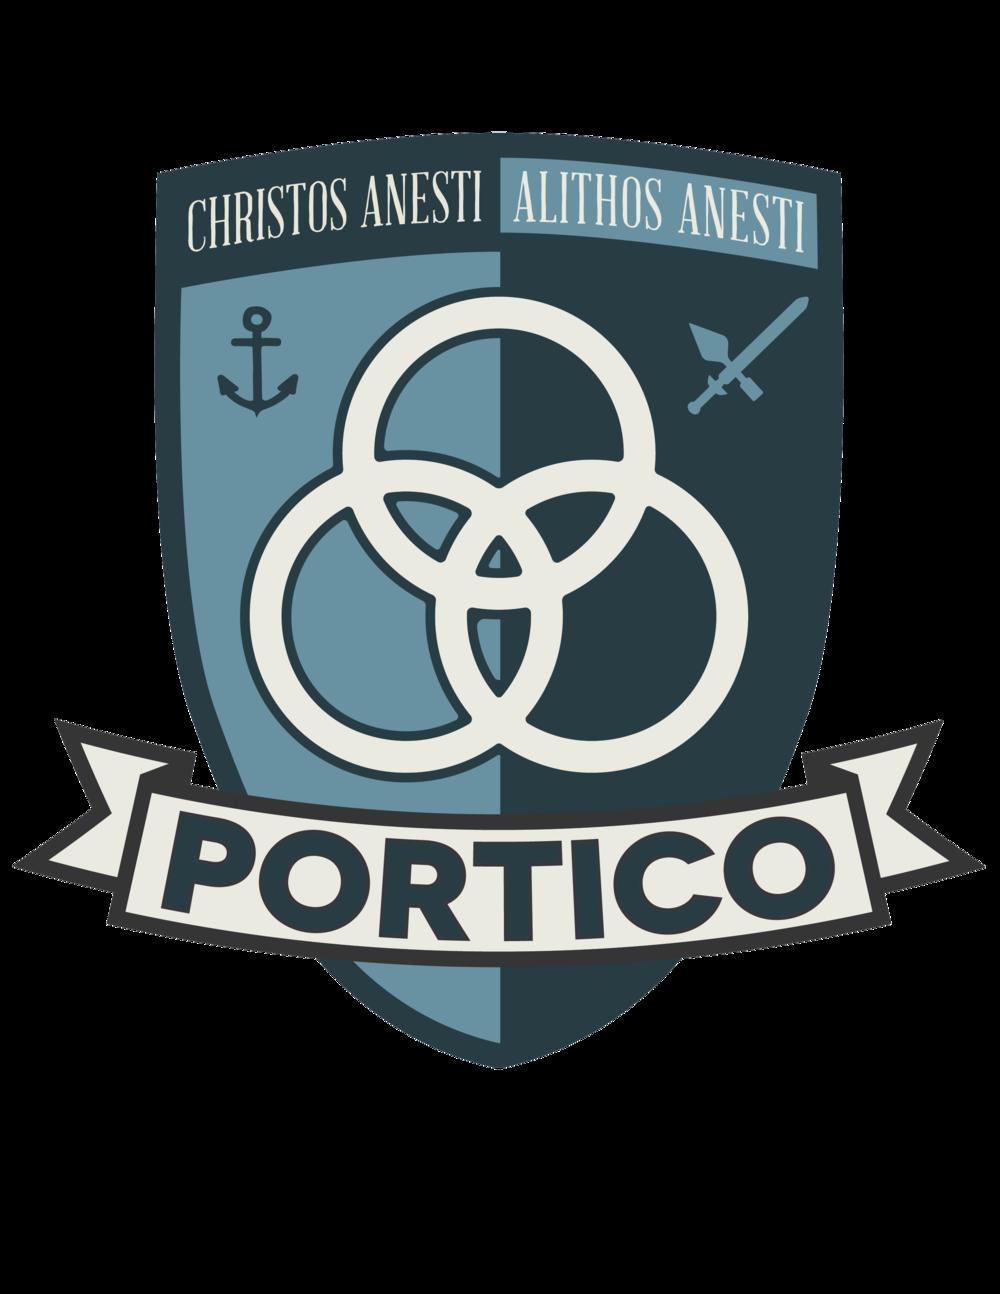 portico logo.jpg